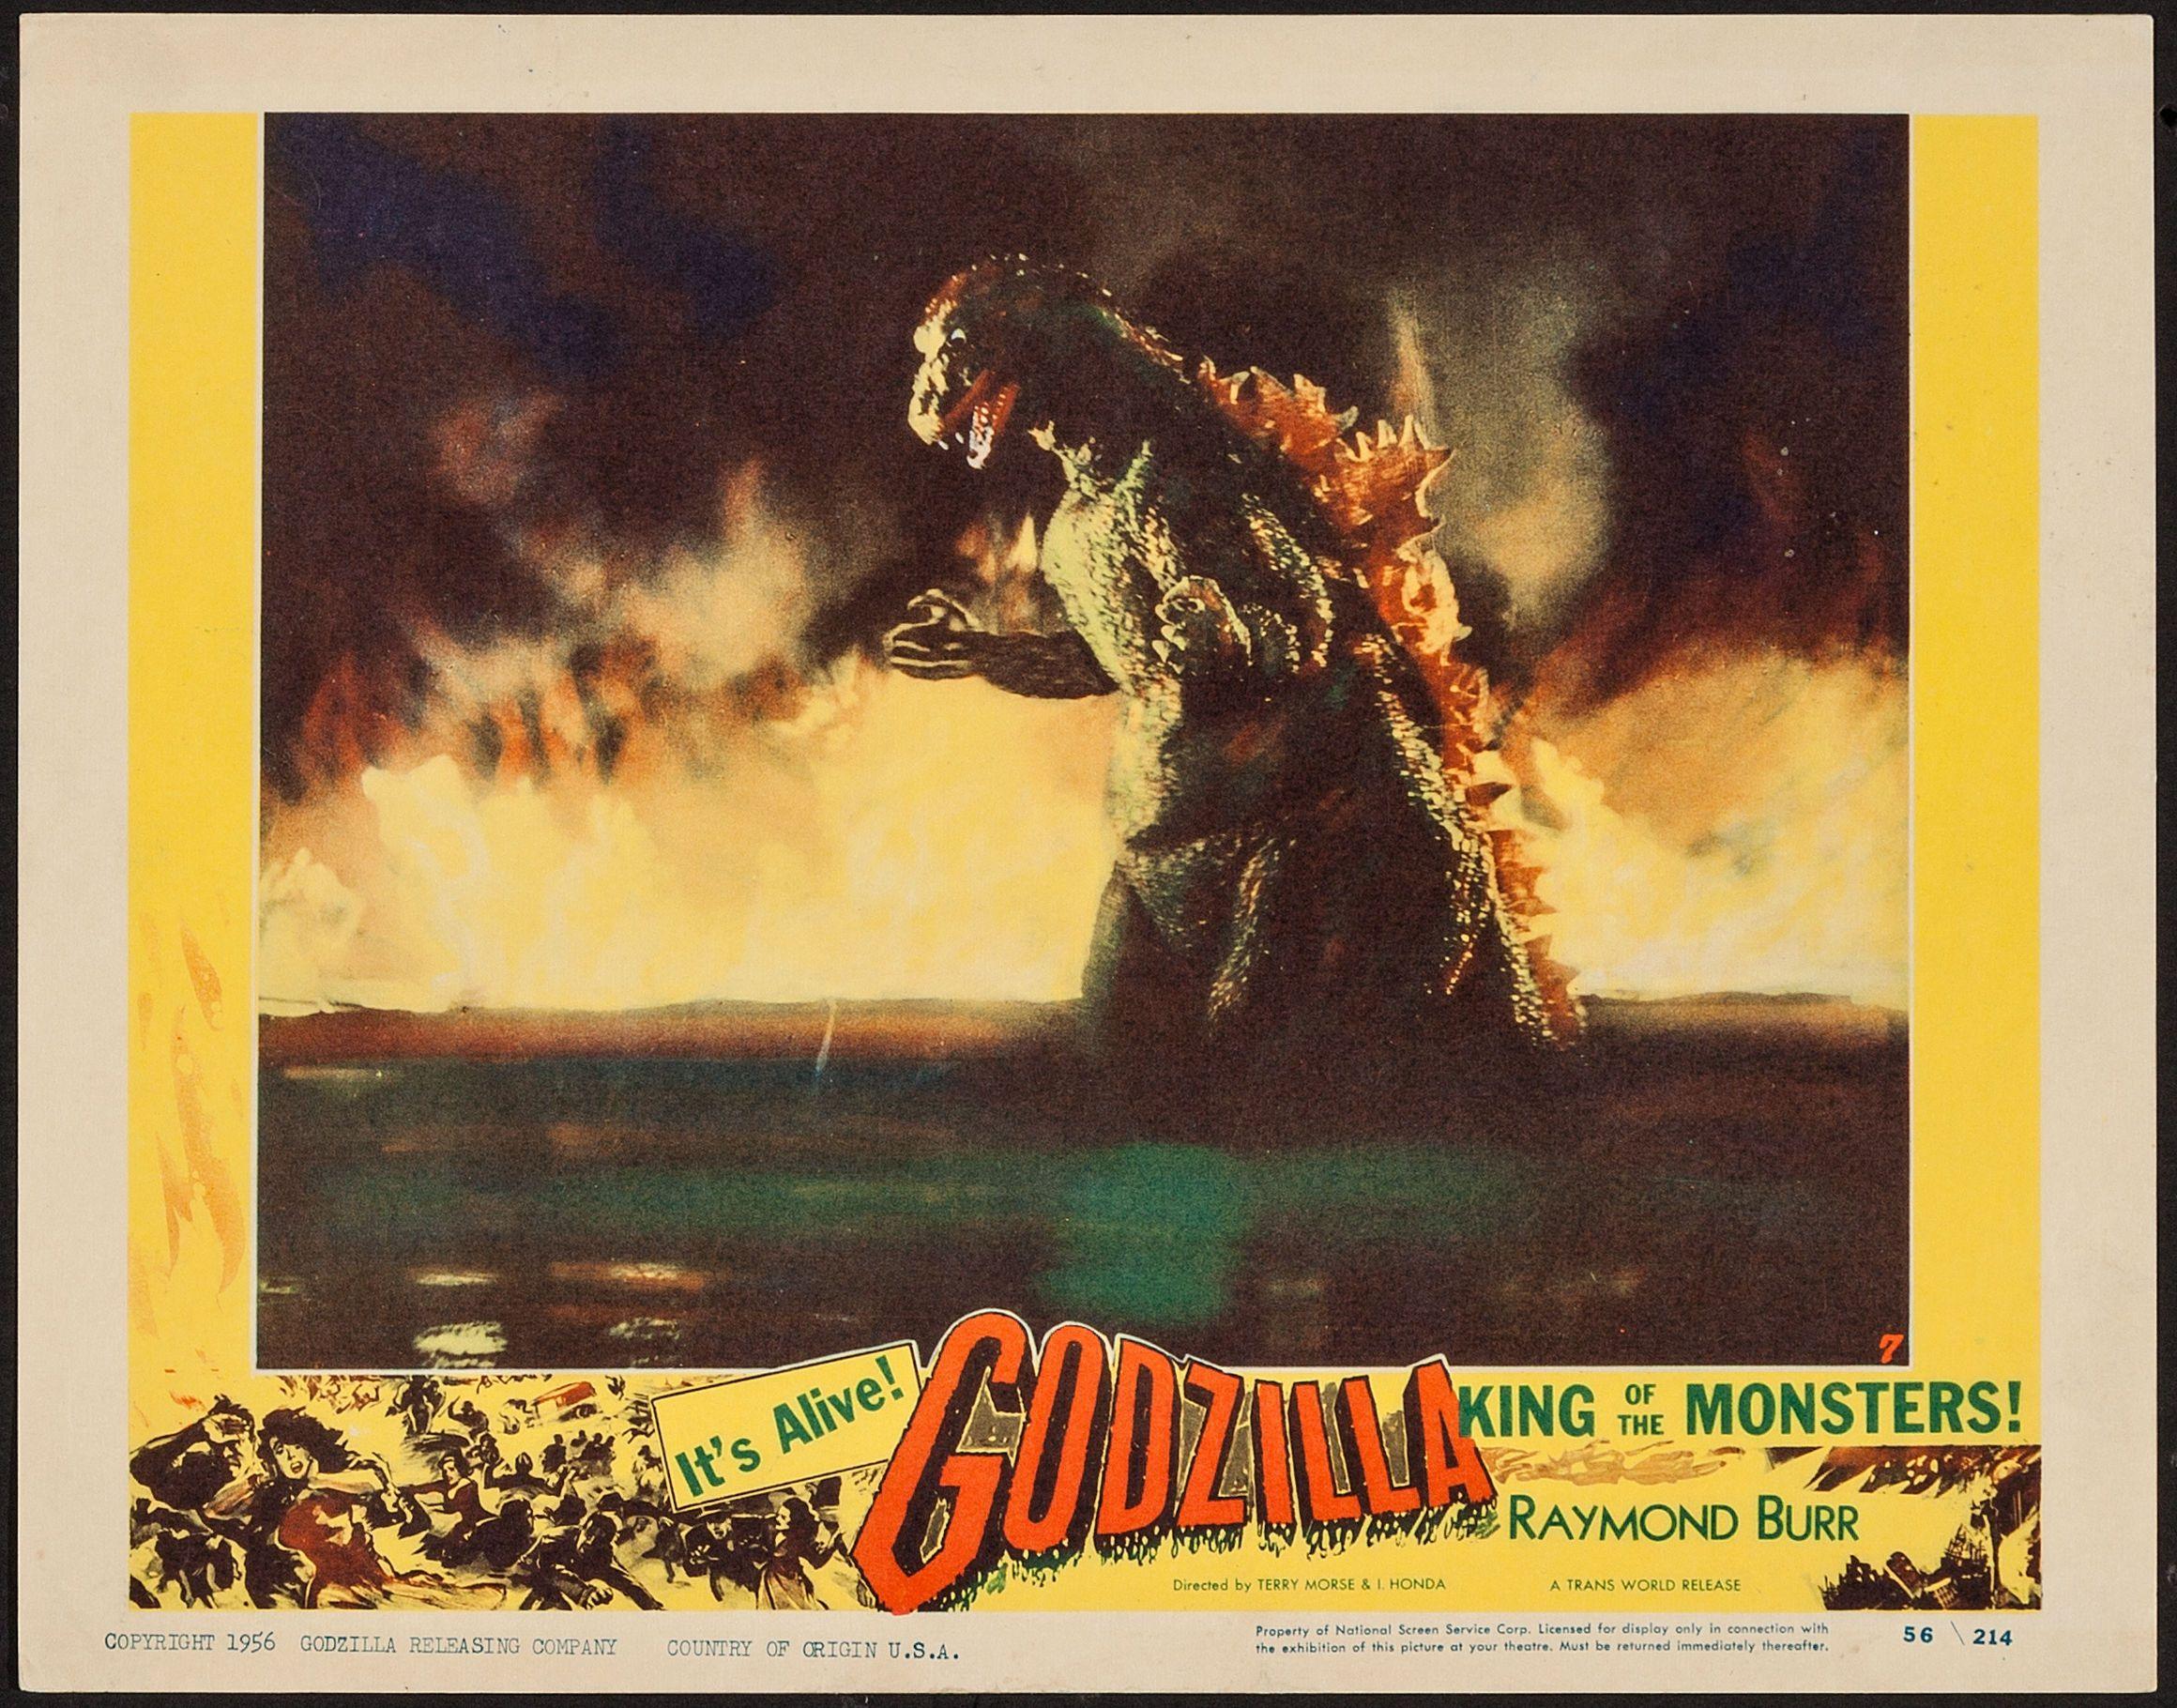 Lobby card for the American release of Godzilla, GODZILLA KING OF ...